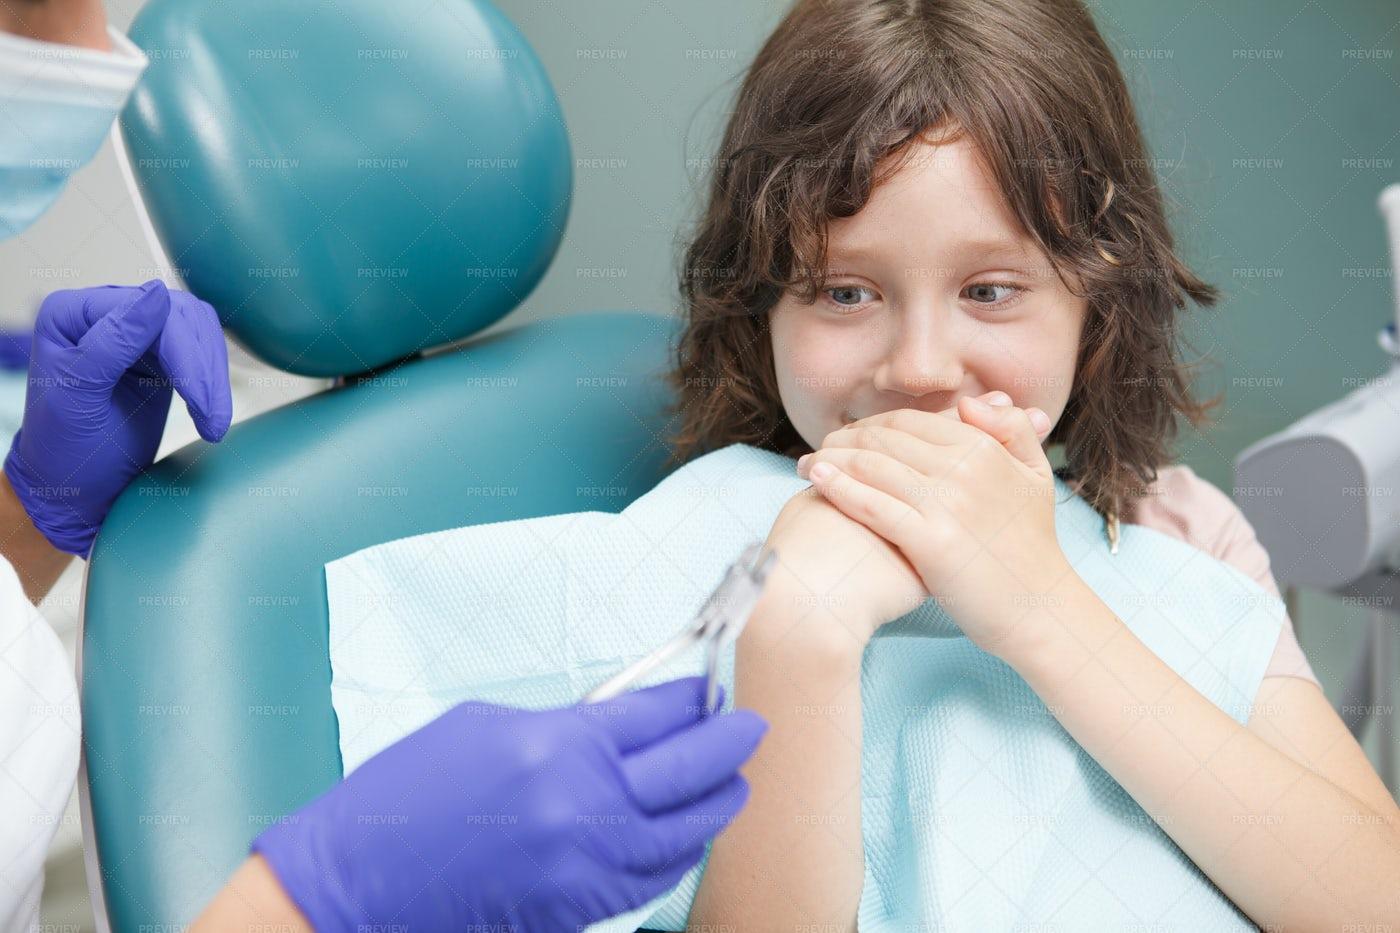 Boy Afraid Of Dental Exam: Stock Photos